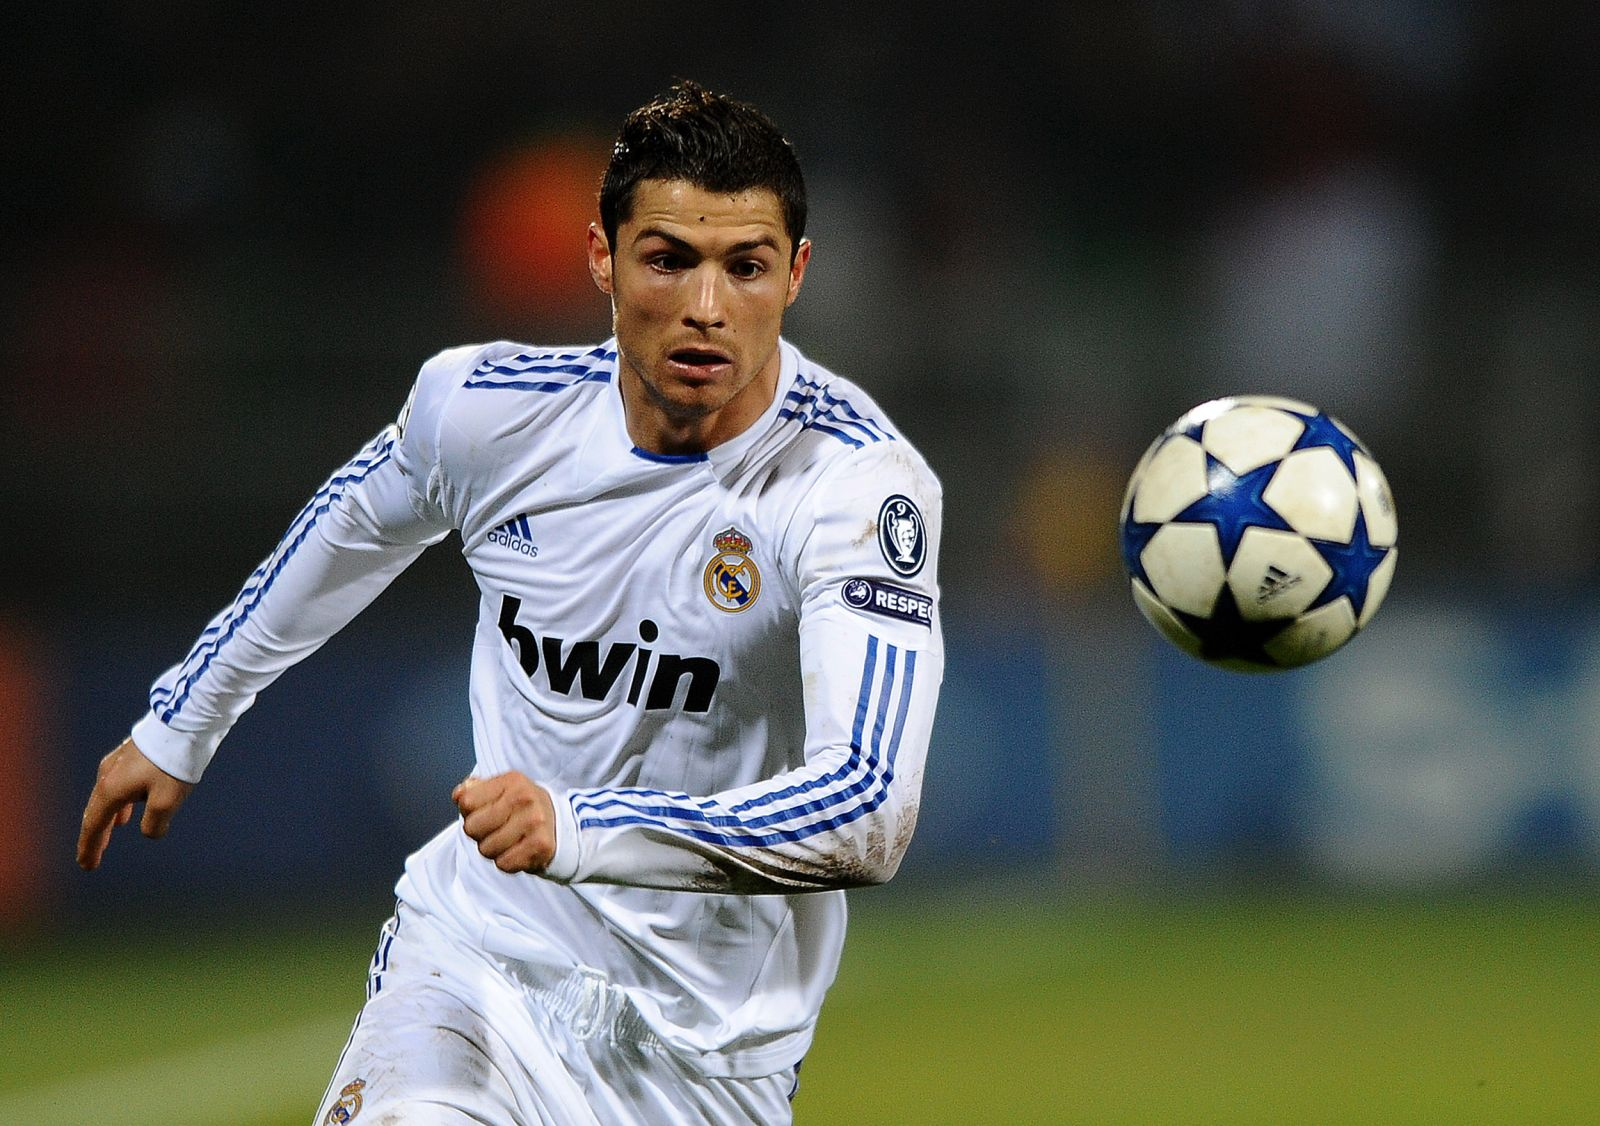 Cristian-Ronaldo-Pictures-HD-1080p-07